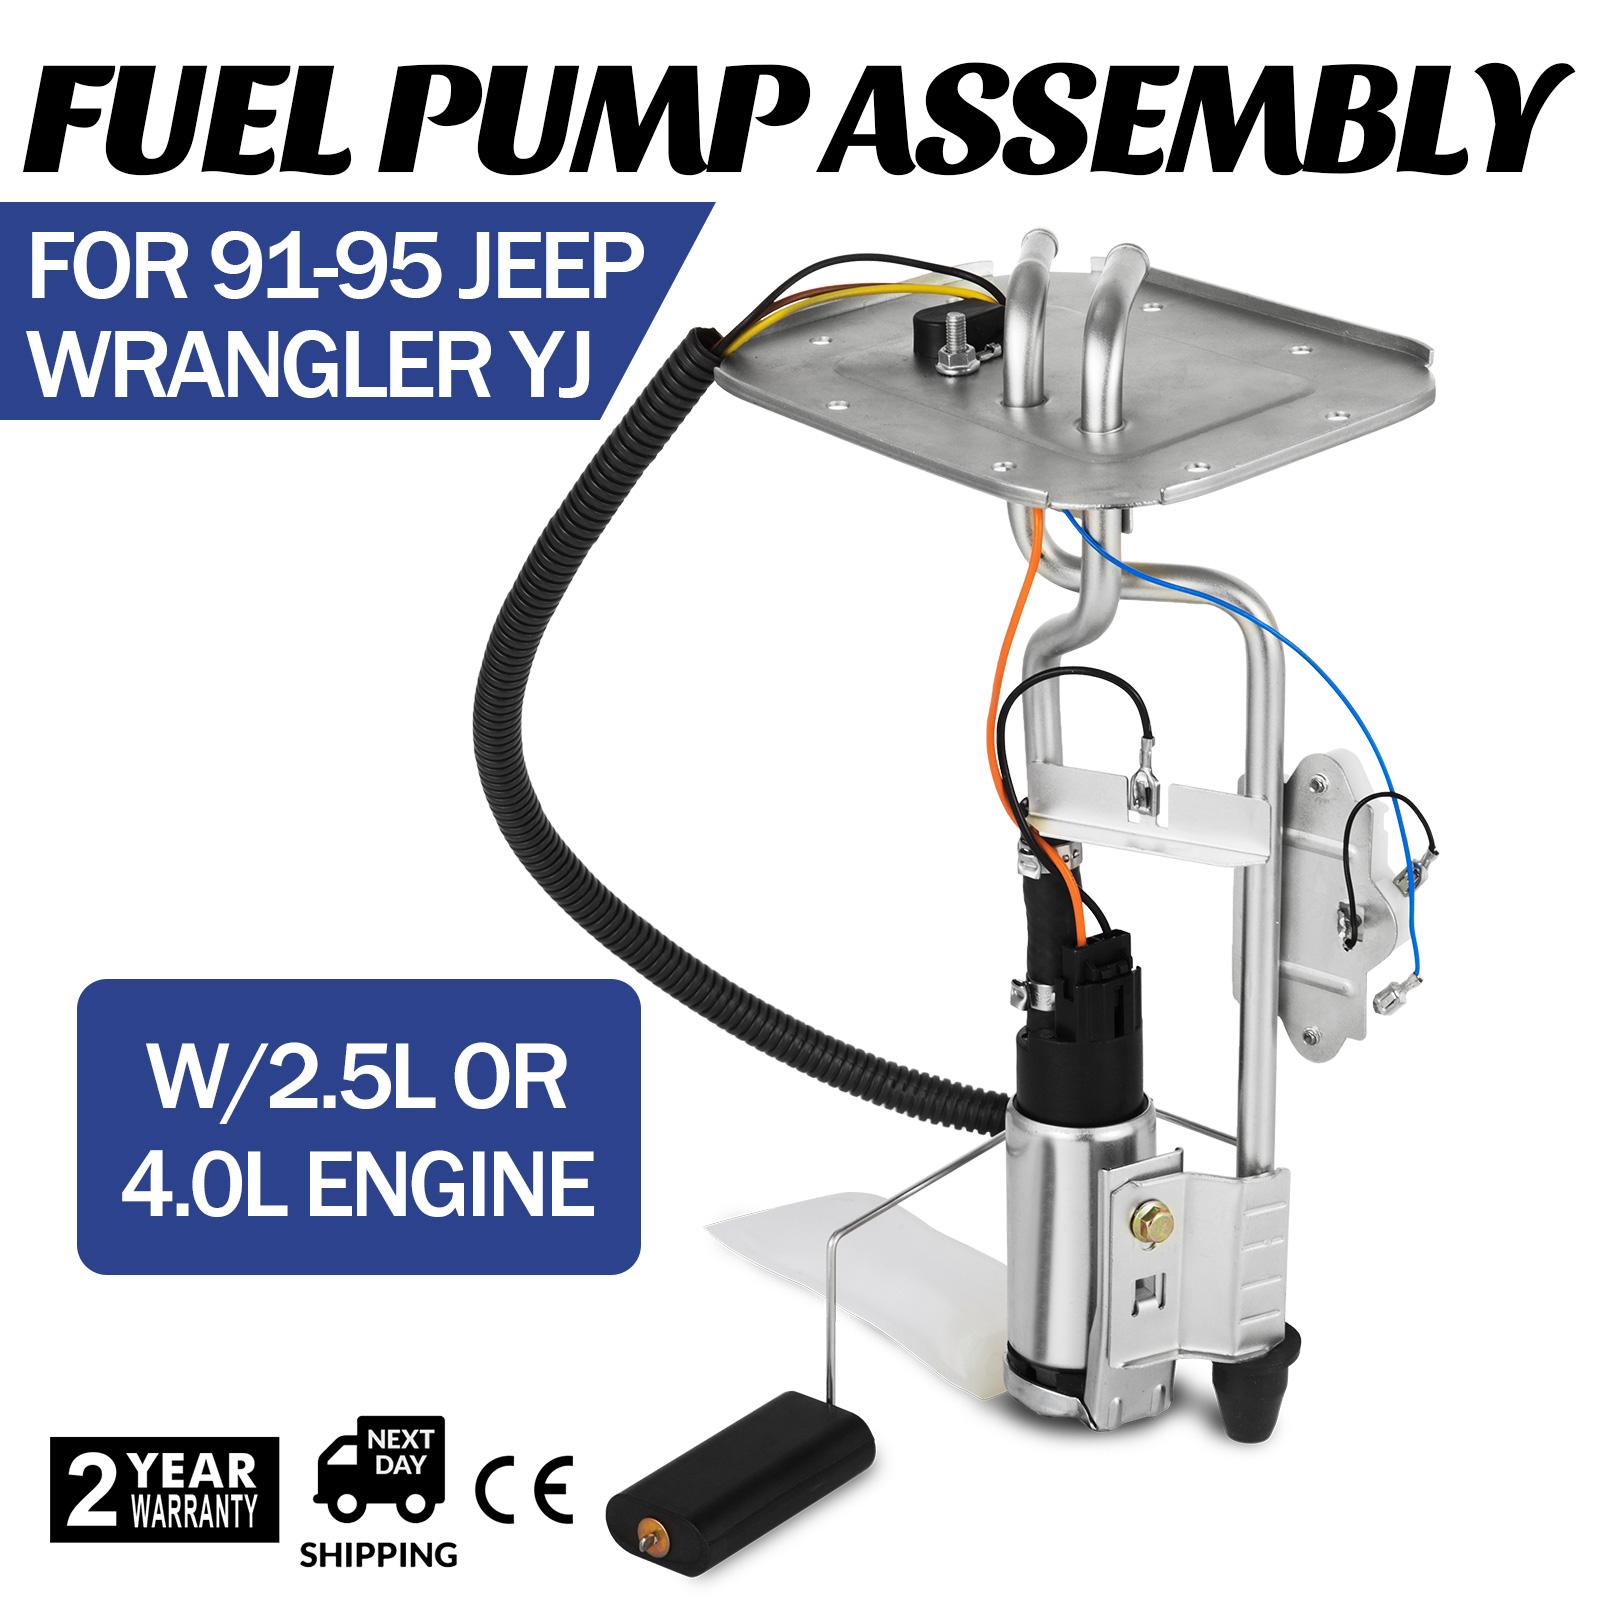 Fuel Pump Sending Unit for Jeep Wrangler 91 95 YJ 20 Gallon 2.5L 4.0L 92 93 94